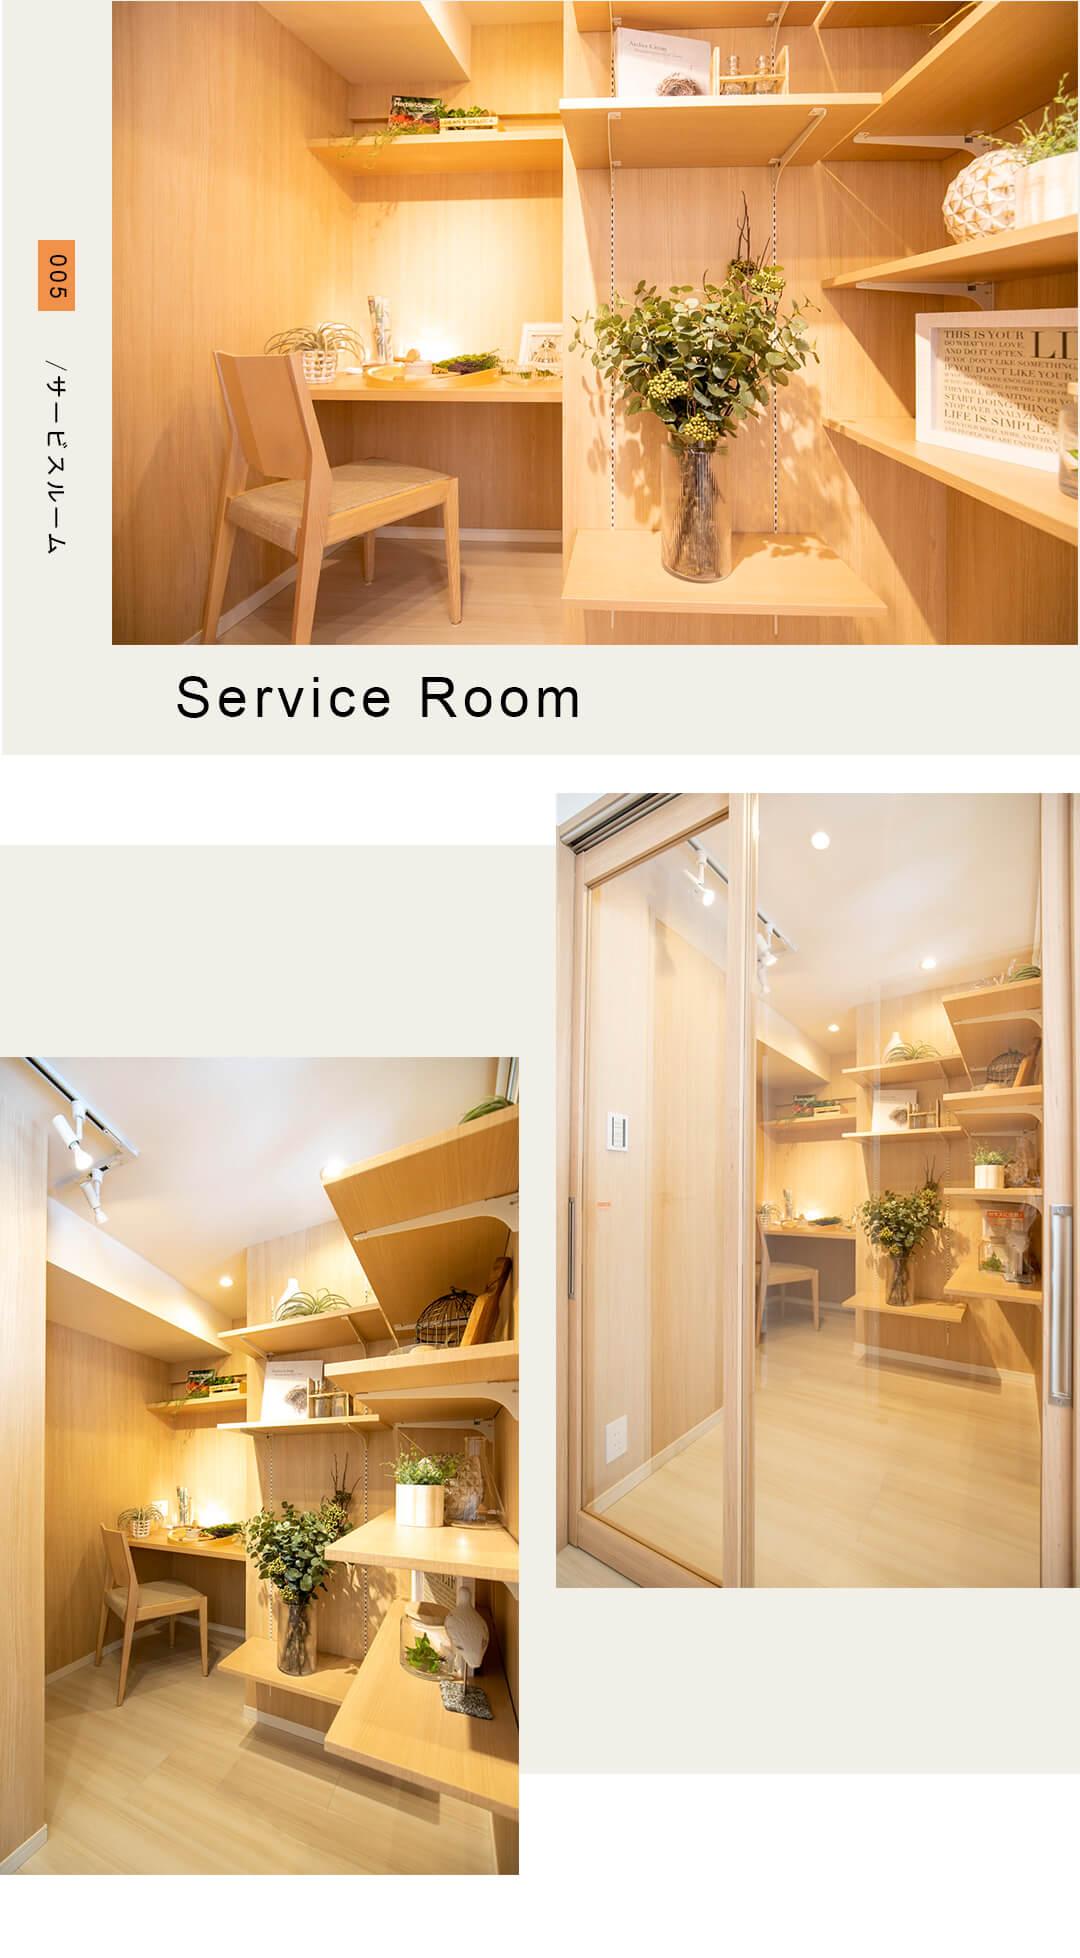 005,Serviceroom,サービスルーム